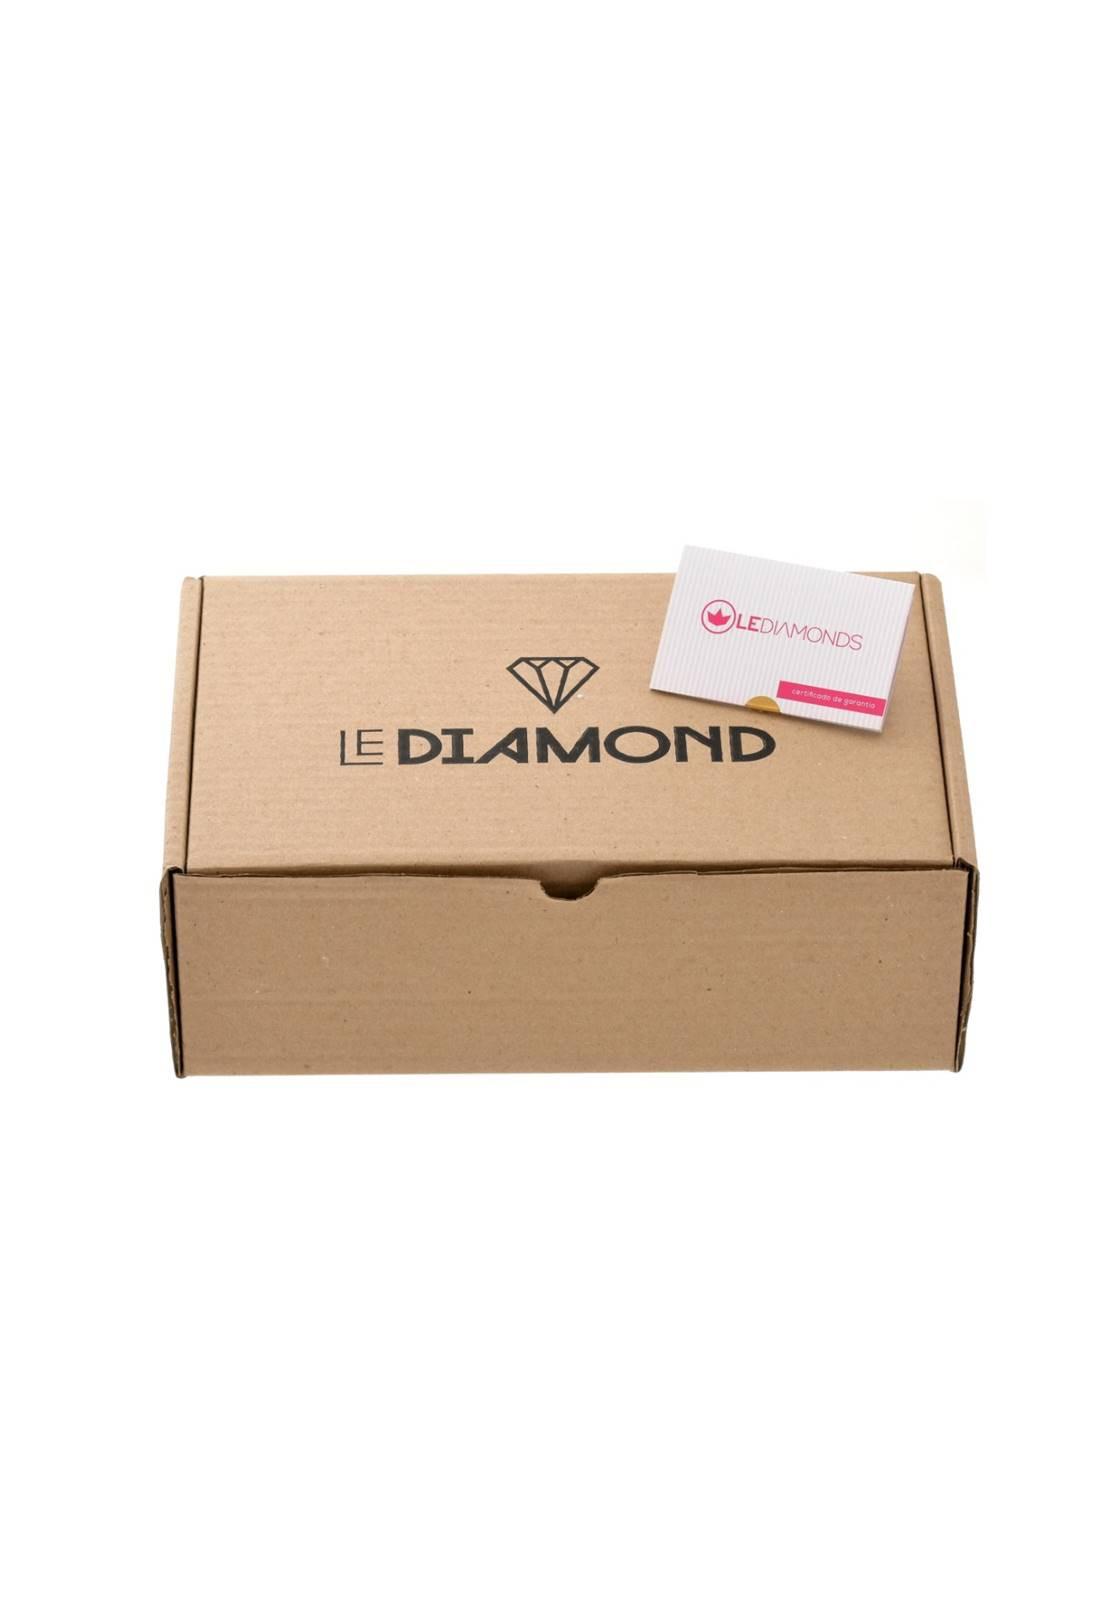 Brinco Le Diamond Argola com Franja Dourado